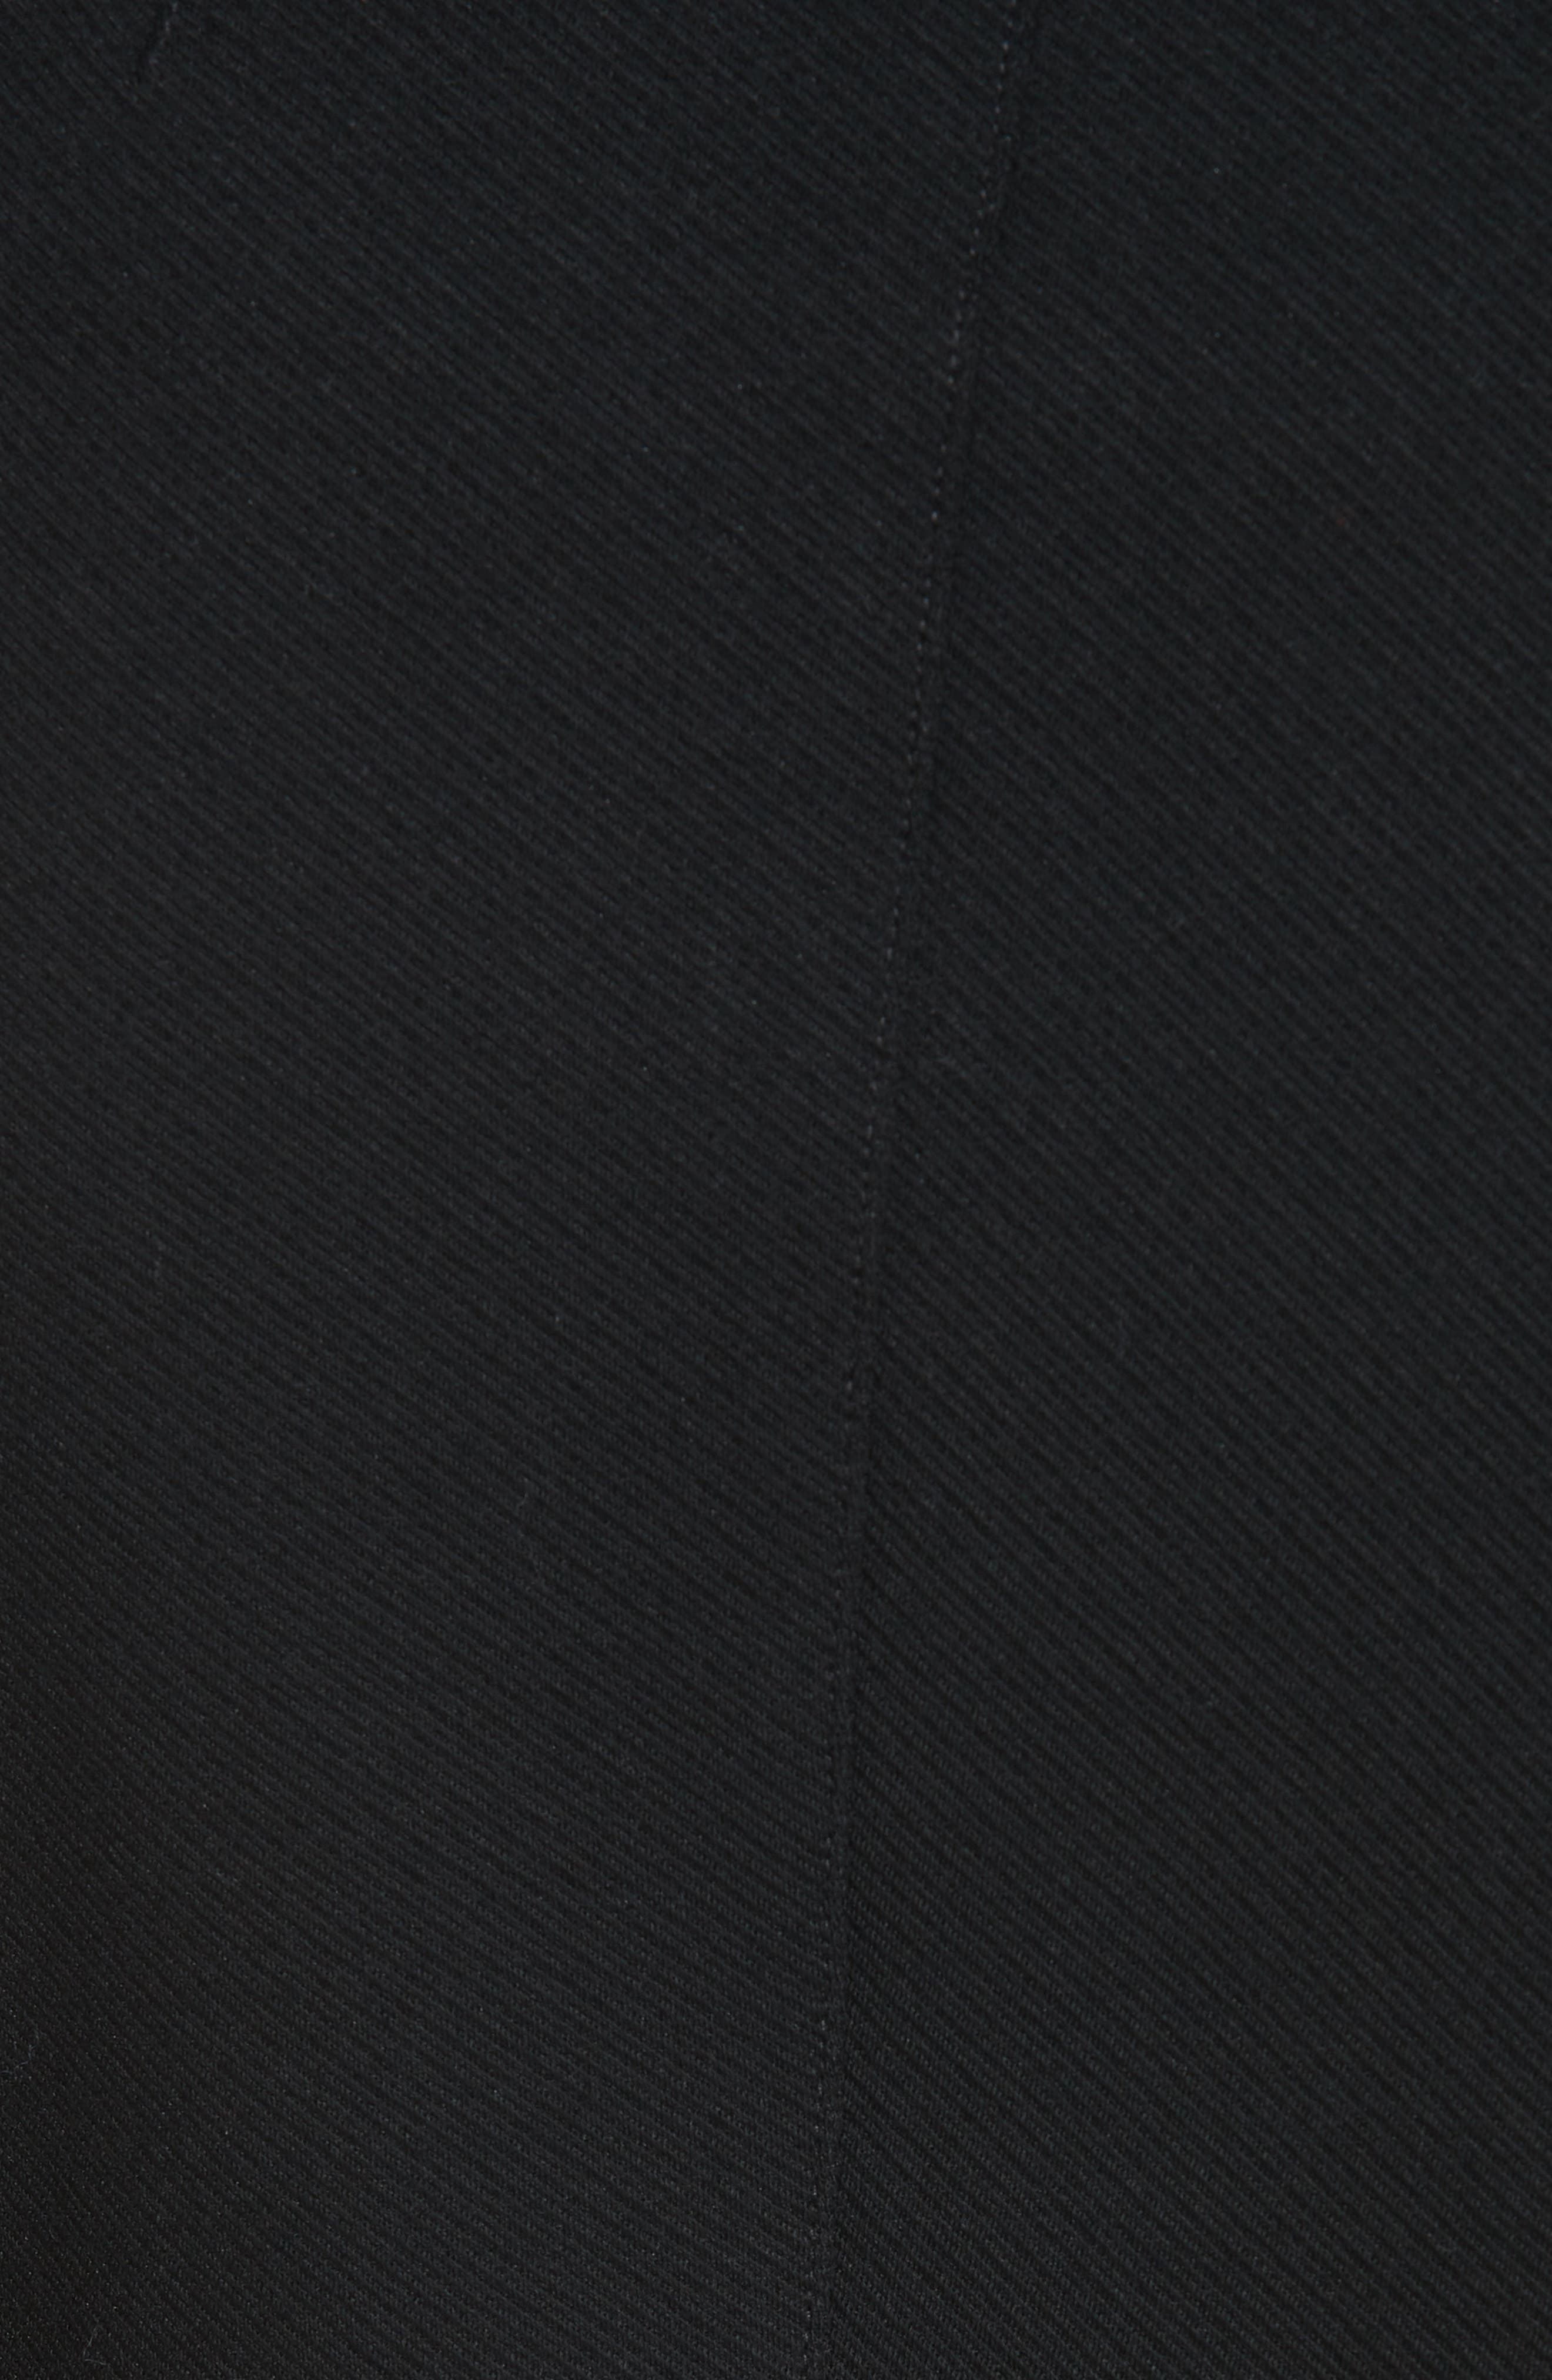 Sculpted Twill Knit Jacket,                             Alternate thumbnail 6, color,                             BLACK